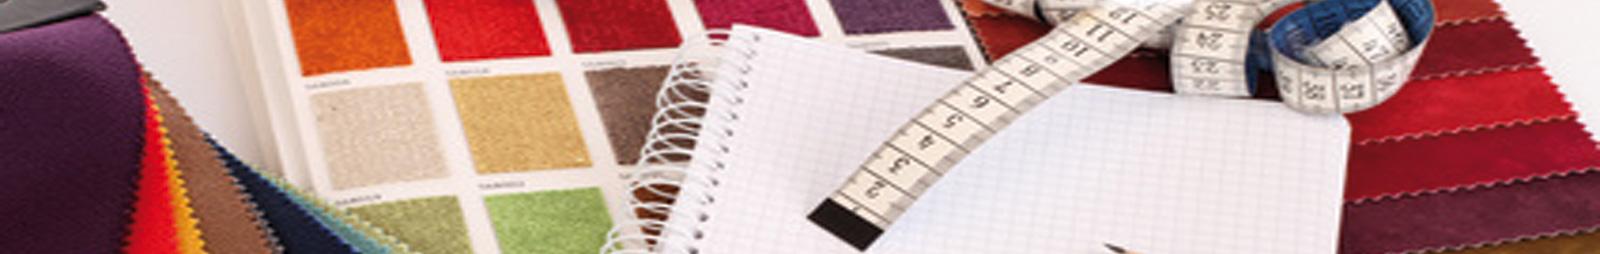 Große Auswahl an Stoffen - Tapeten - Farben